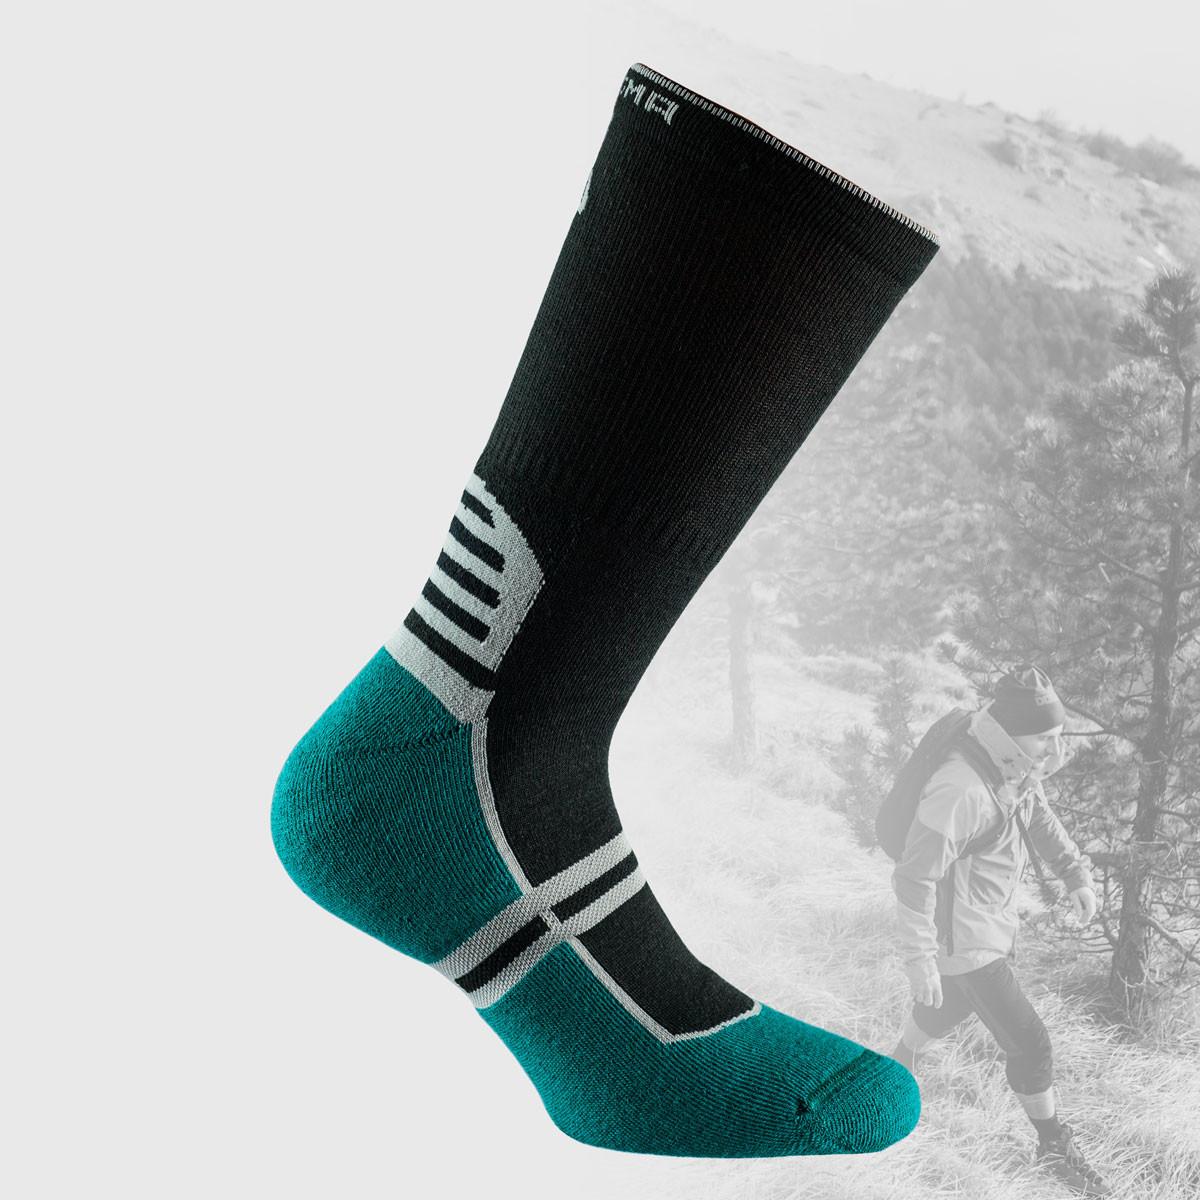 black hiking socks with green sole